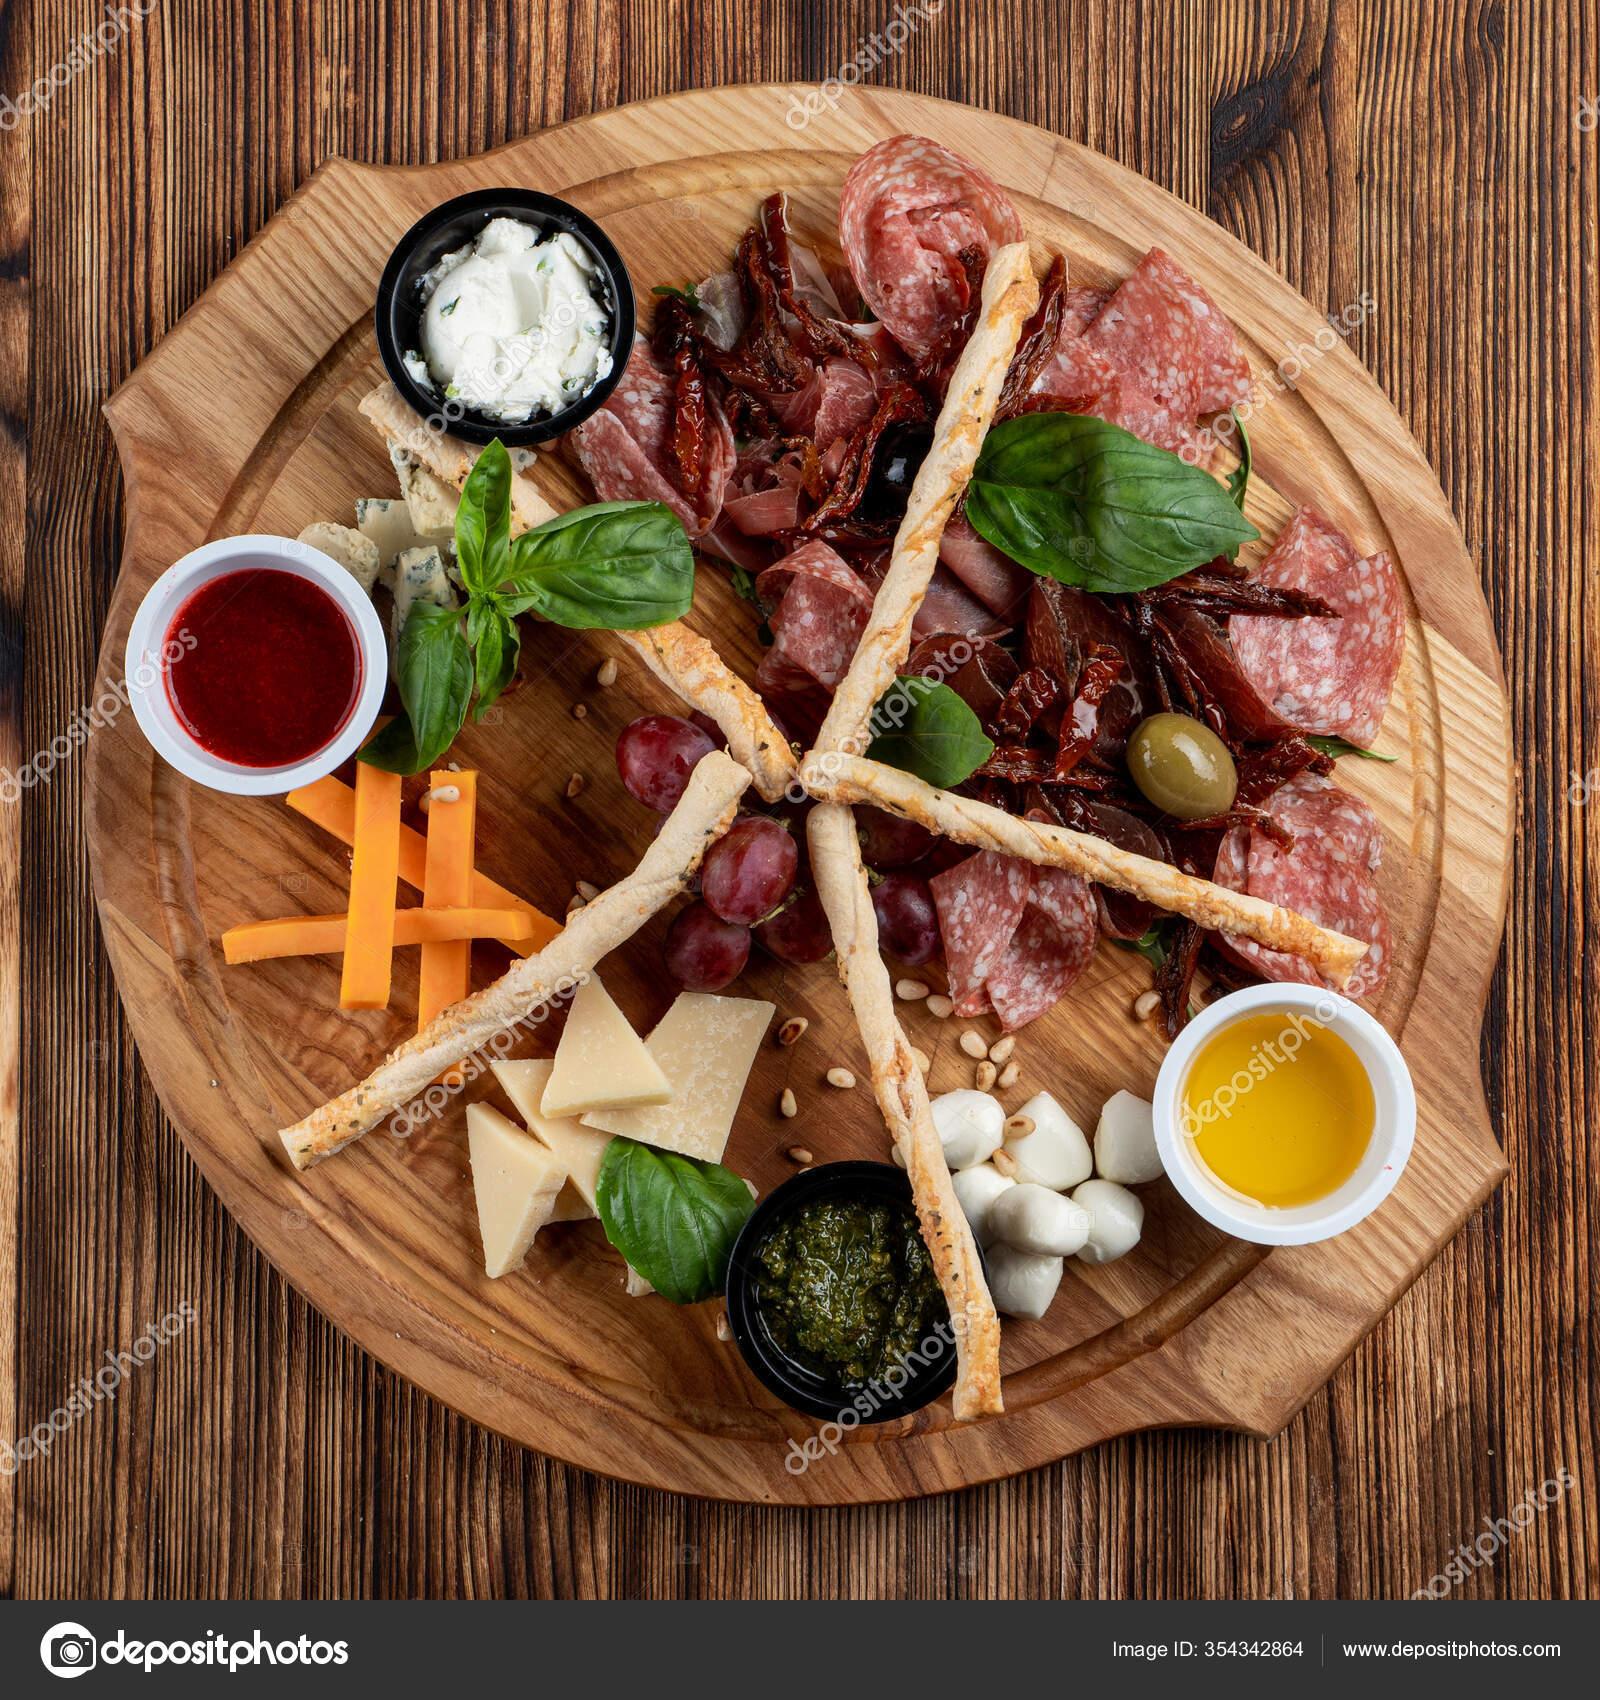 Wine Platter Assorted Snacks Grissini Cheese Sliced Meat Nuts Wooden Stock Photo Image By C Tkachenkoalexx Mail Ru 354342864